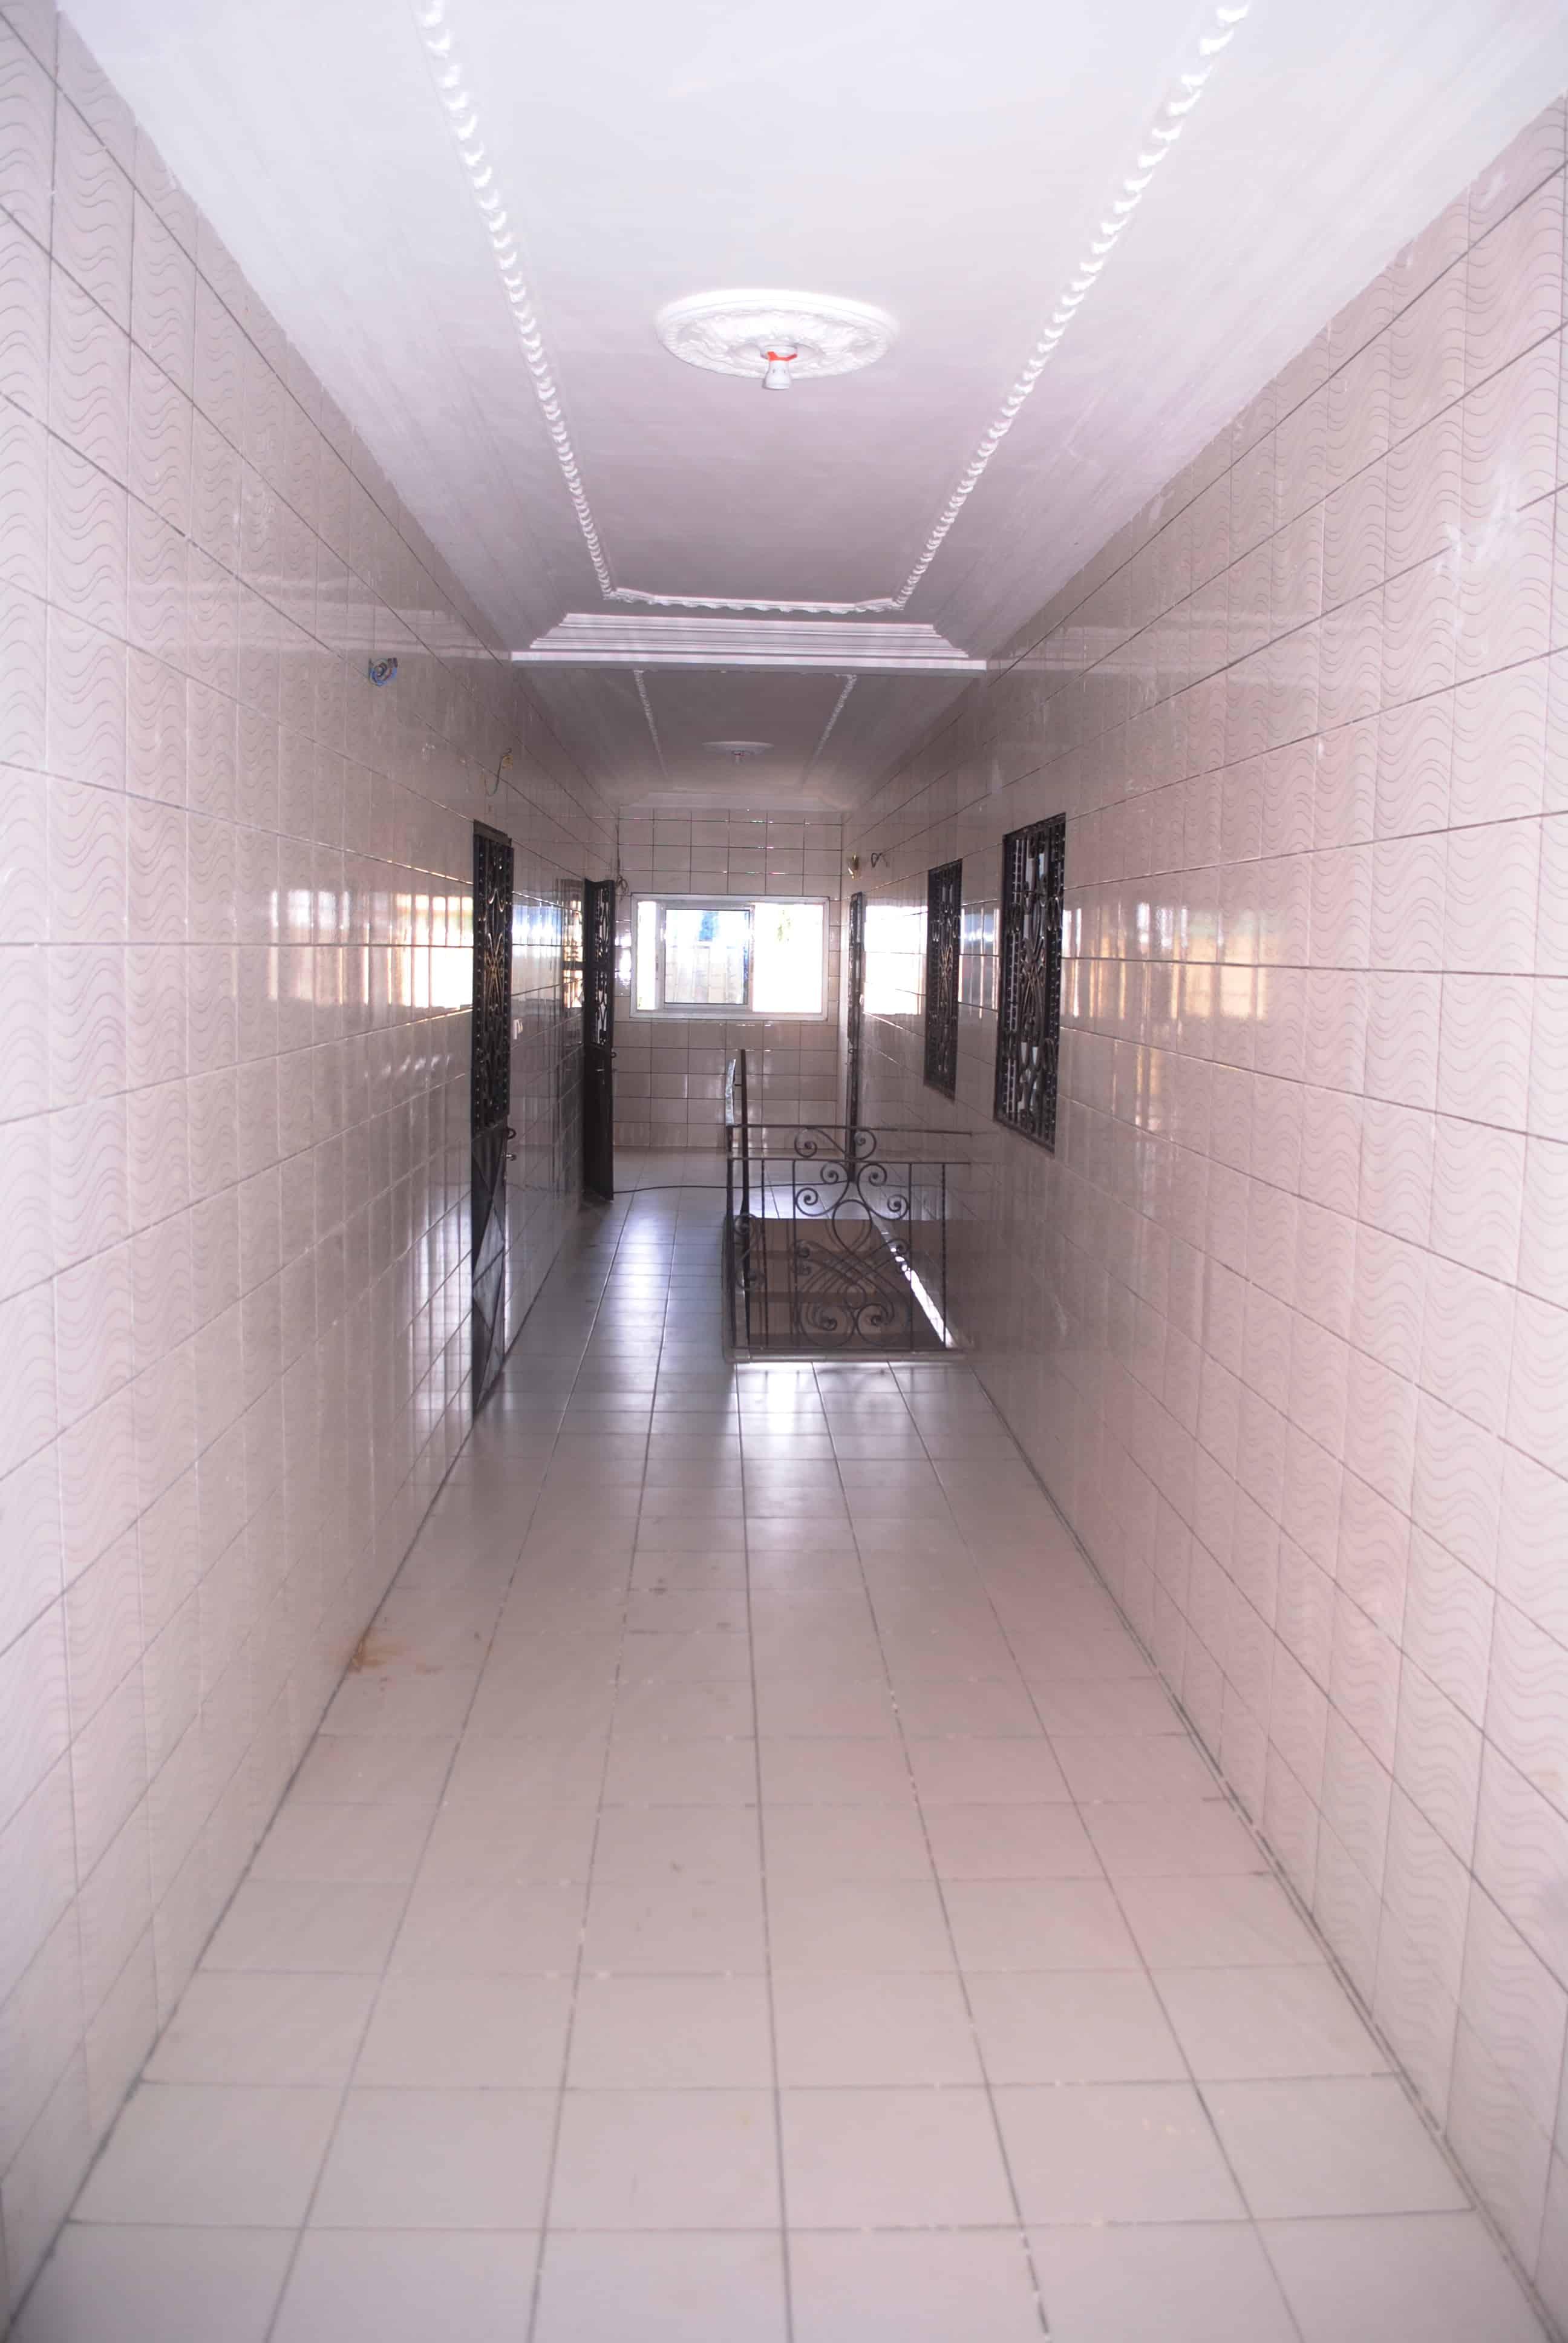 Apartment to rent - Douala, Logbessou I, eglise saint basile , carrefour temgoua - 1 living room(s), 2 bedroom(s), 1 bathroom(s) - 110 000 FCFA / month